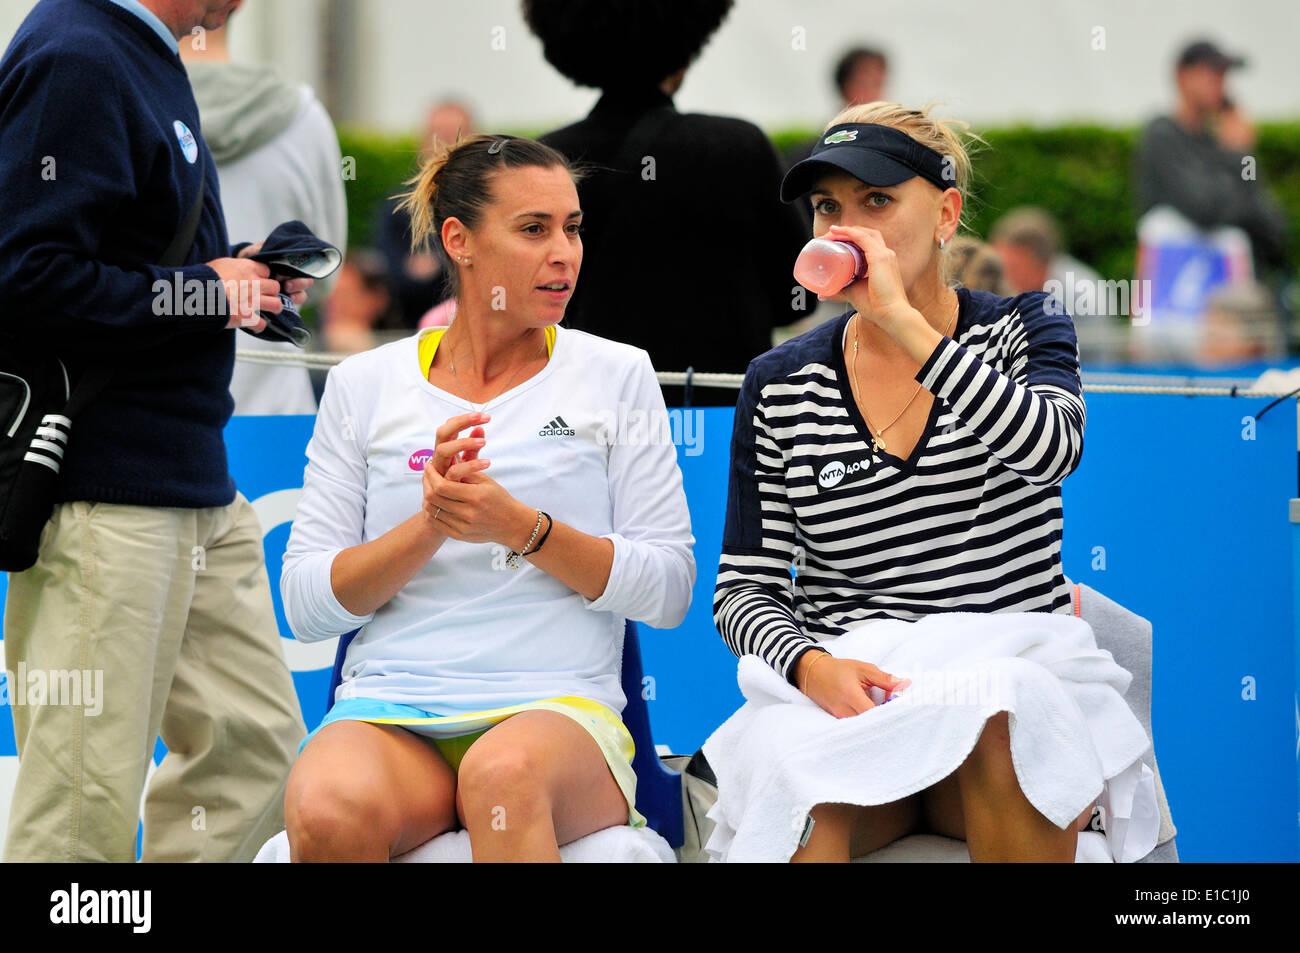 Flavia Pennetta (Italia) y Elena Vesnina (Rusia) jugando dobles en Eastbourne 201 Foto de stock